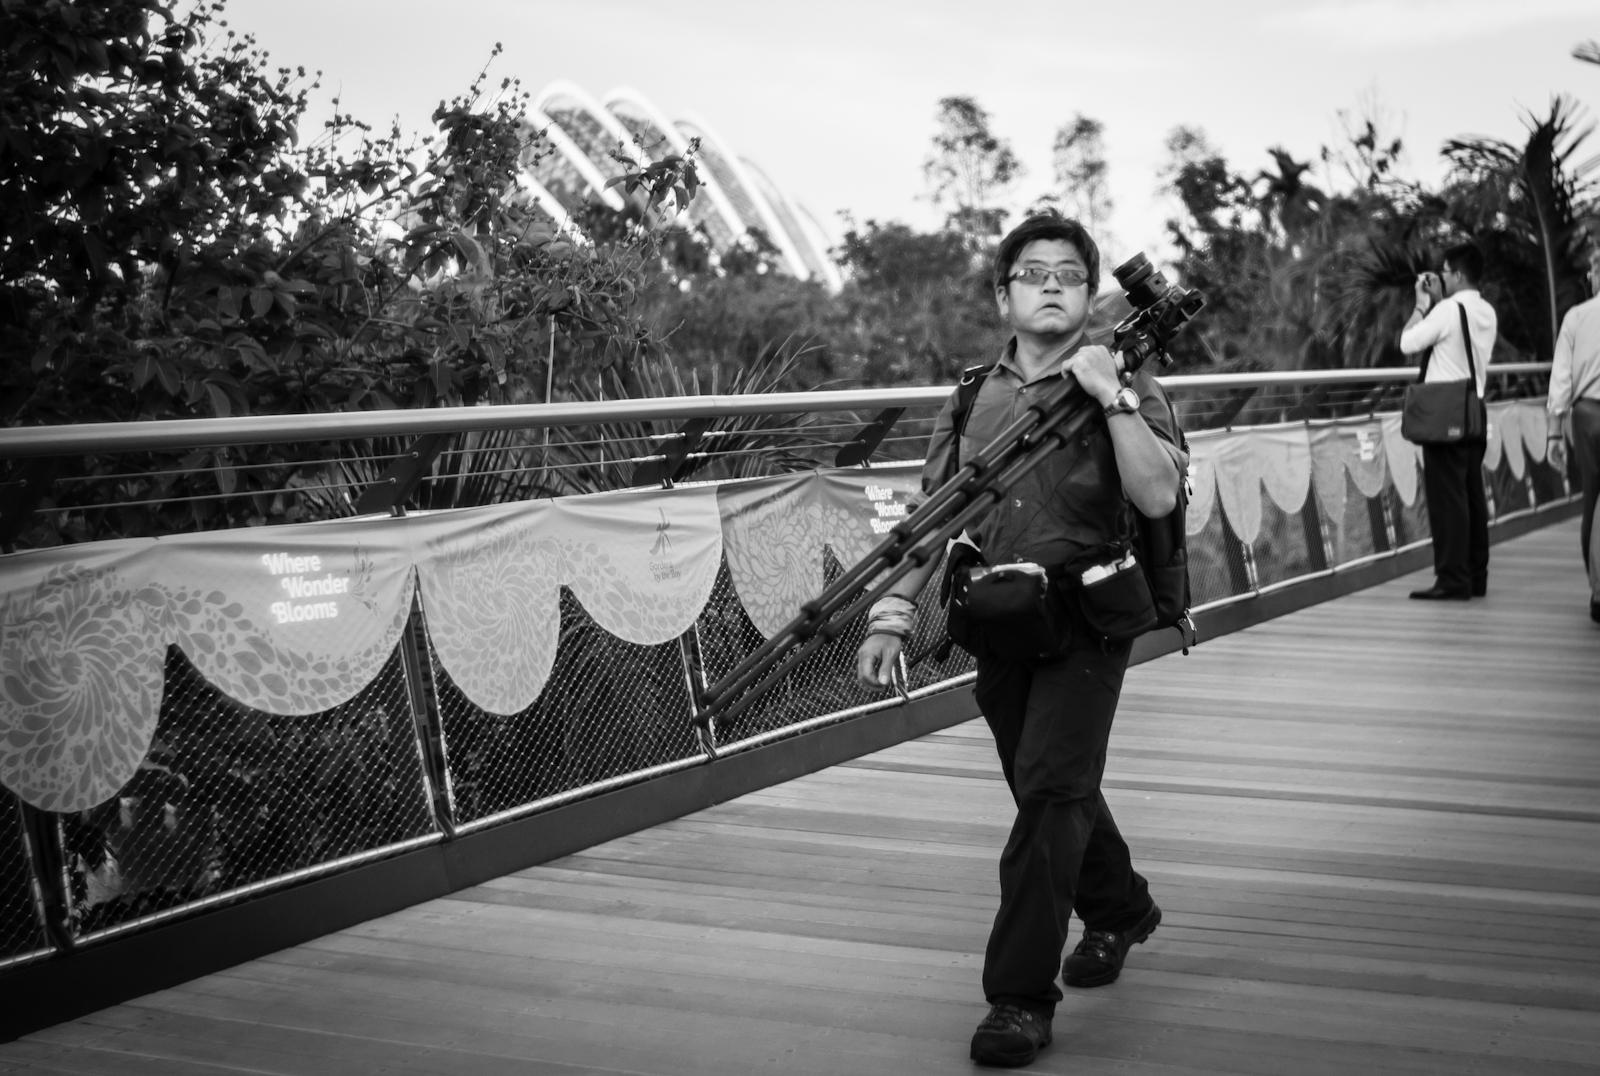 Photographer walking on a bridge